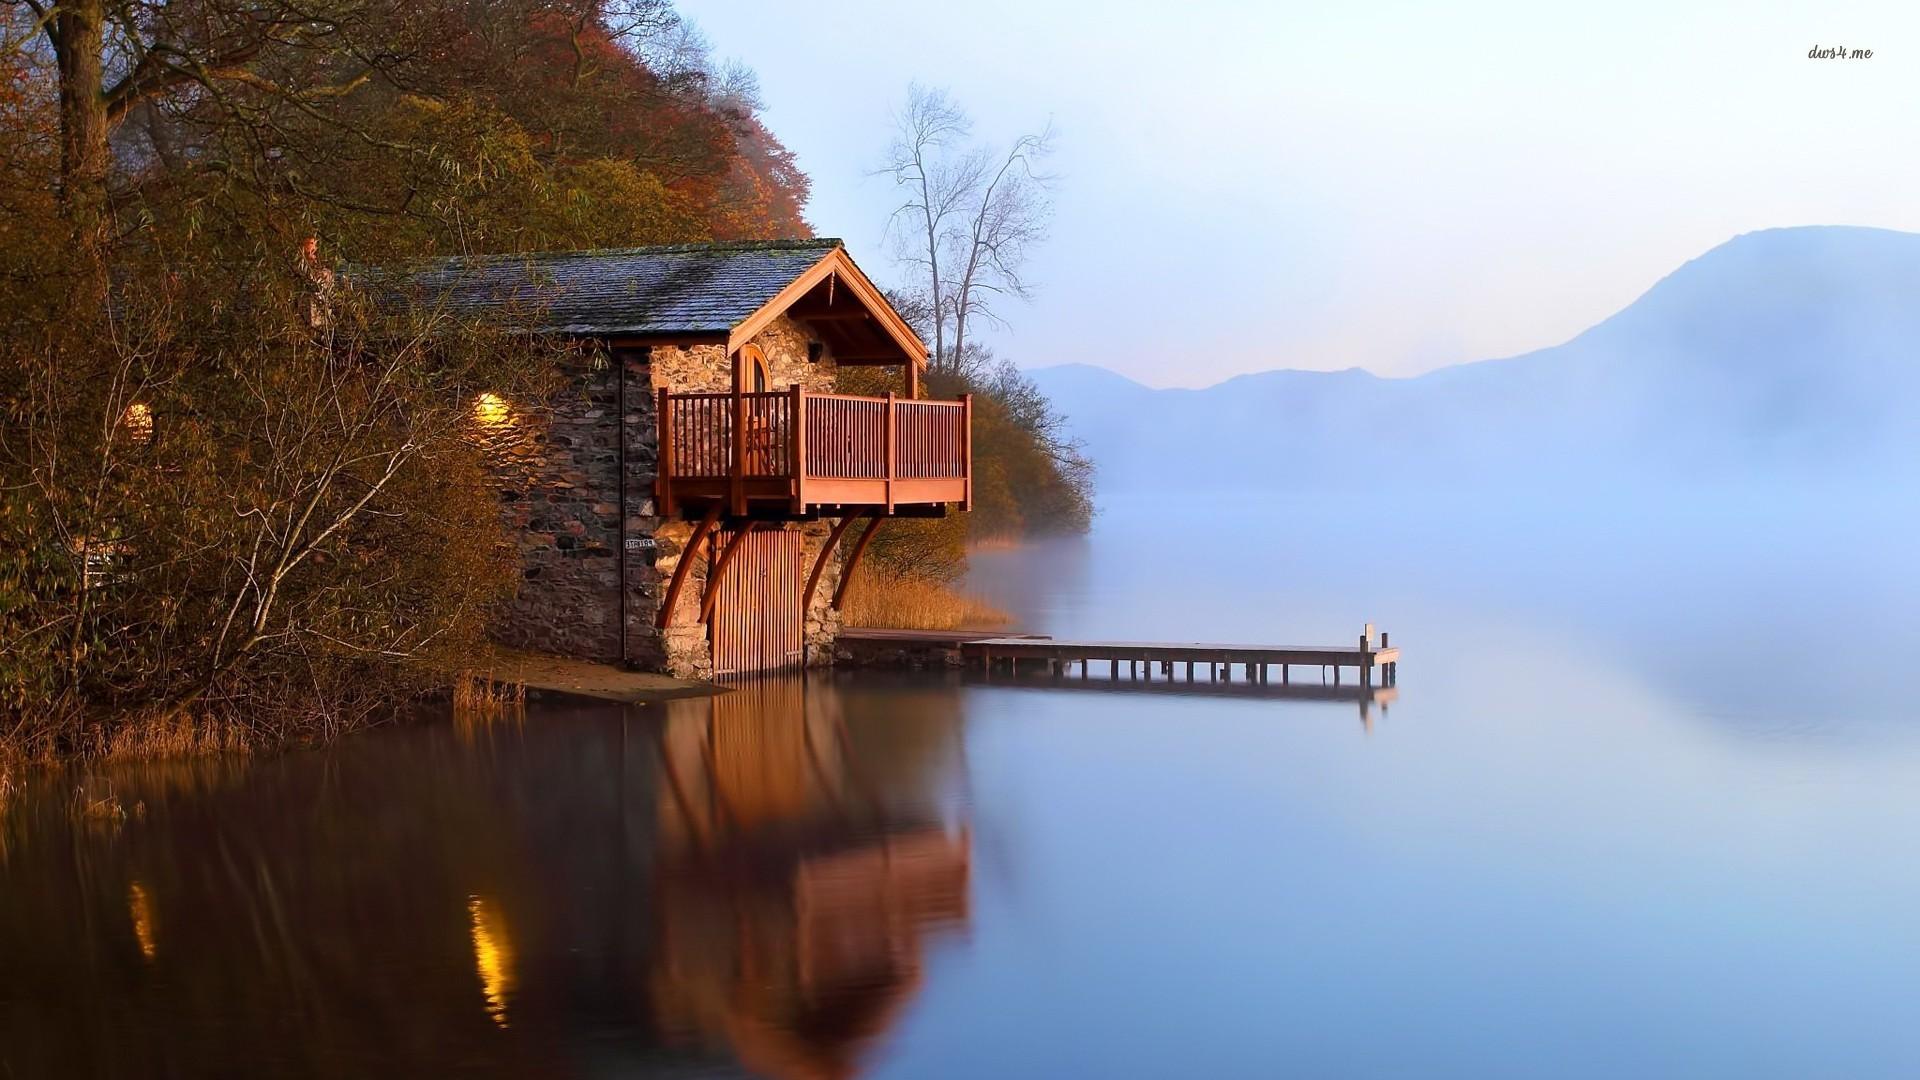 Lake house wallpaper wallpapersafari for The lake housse